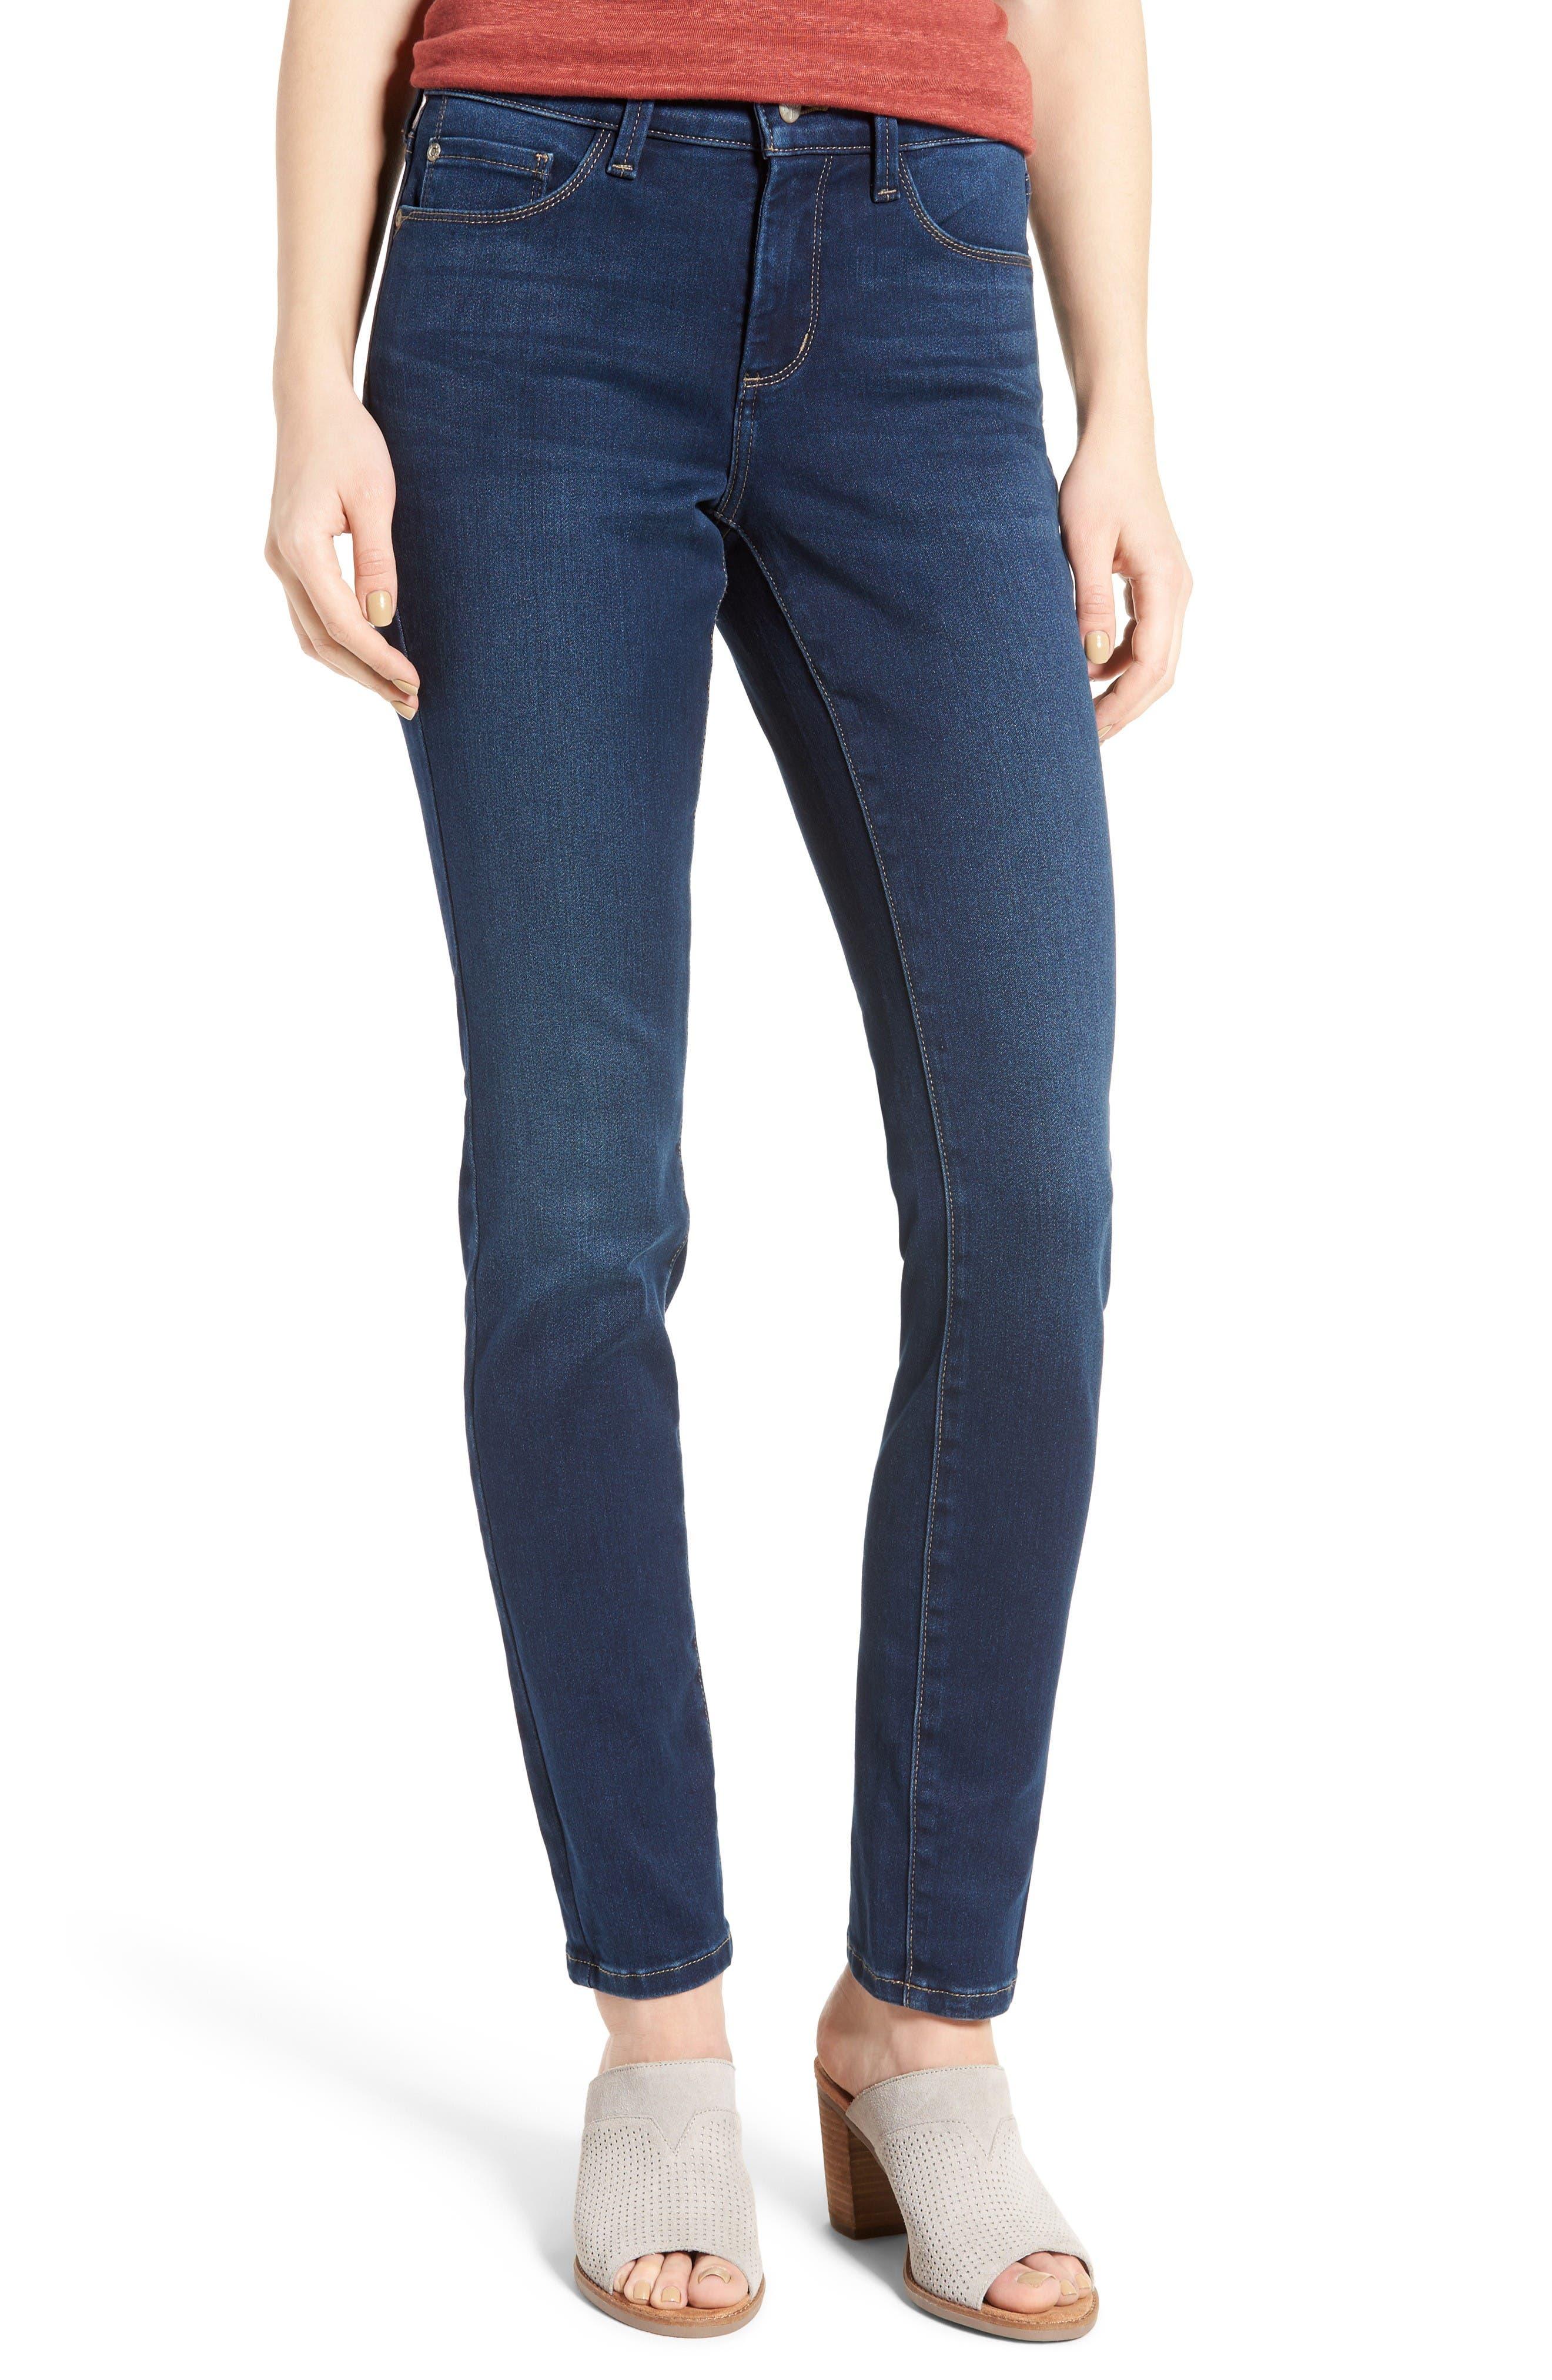 Main Image - NYDJ Alina Stretch Skinny Jeans (Luxembourg)